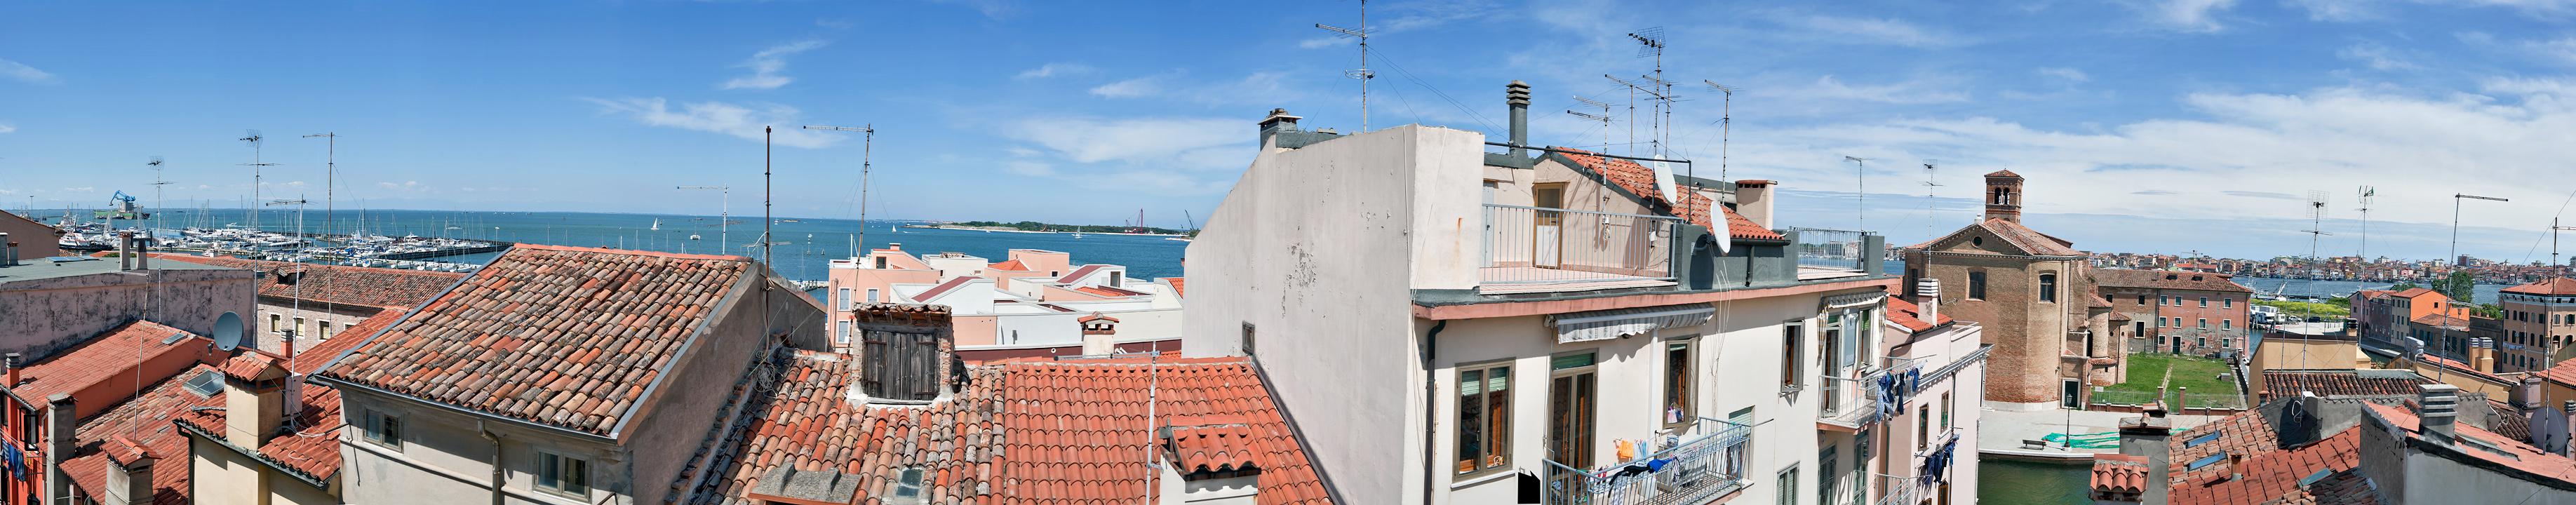 BB-San-Domenico-panoramica-da-altana